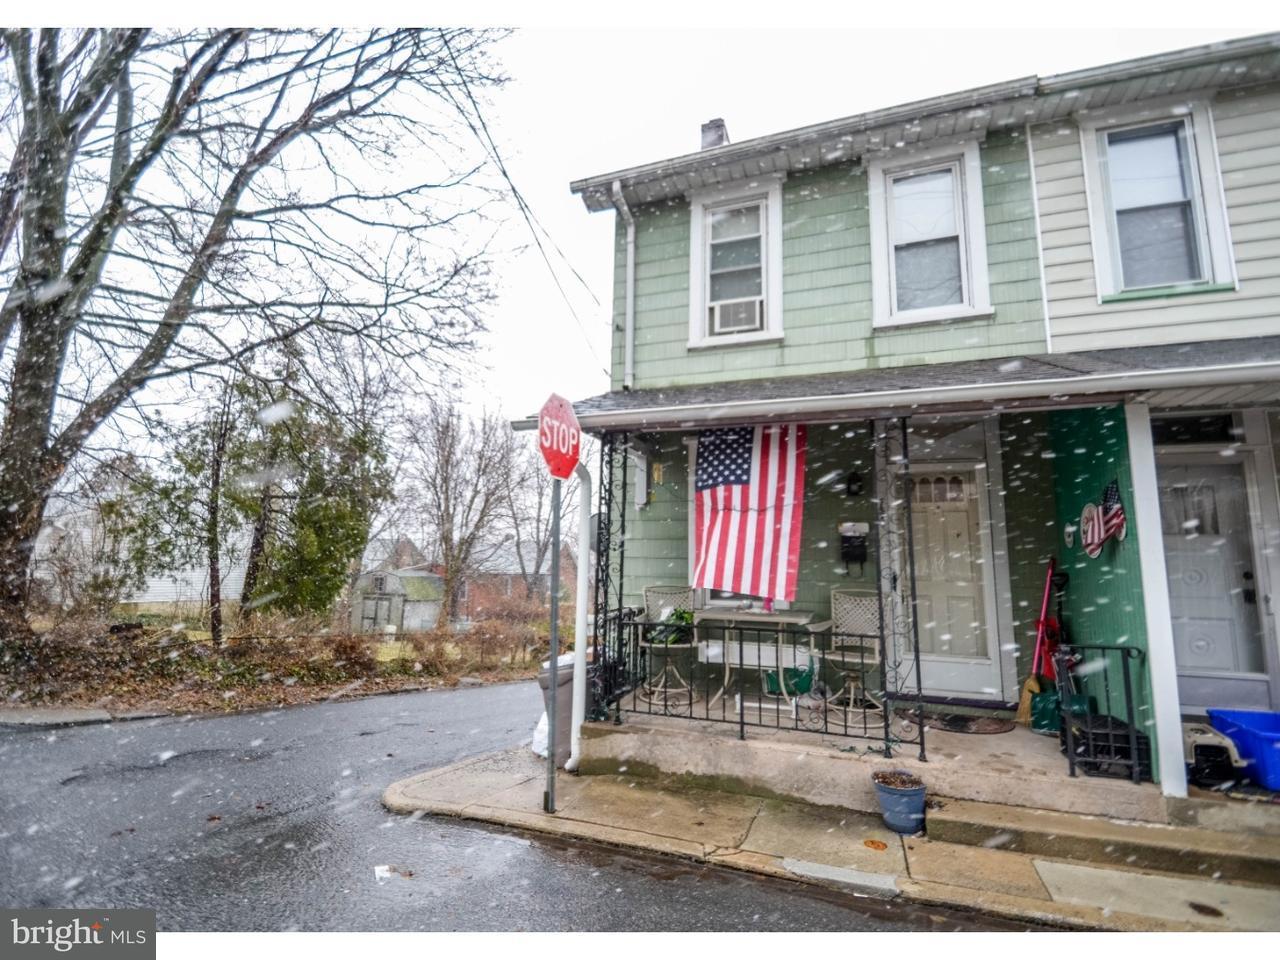 Townhouse for Sale at 754 RAILROAD Street Catasauqua, Pennsylvania 18032 United States